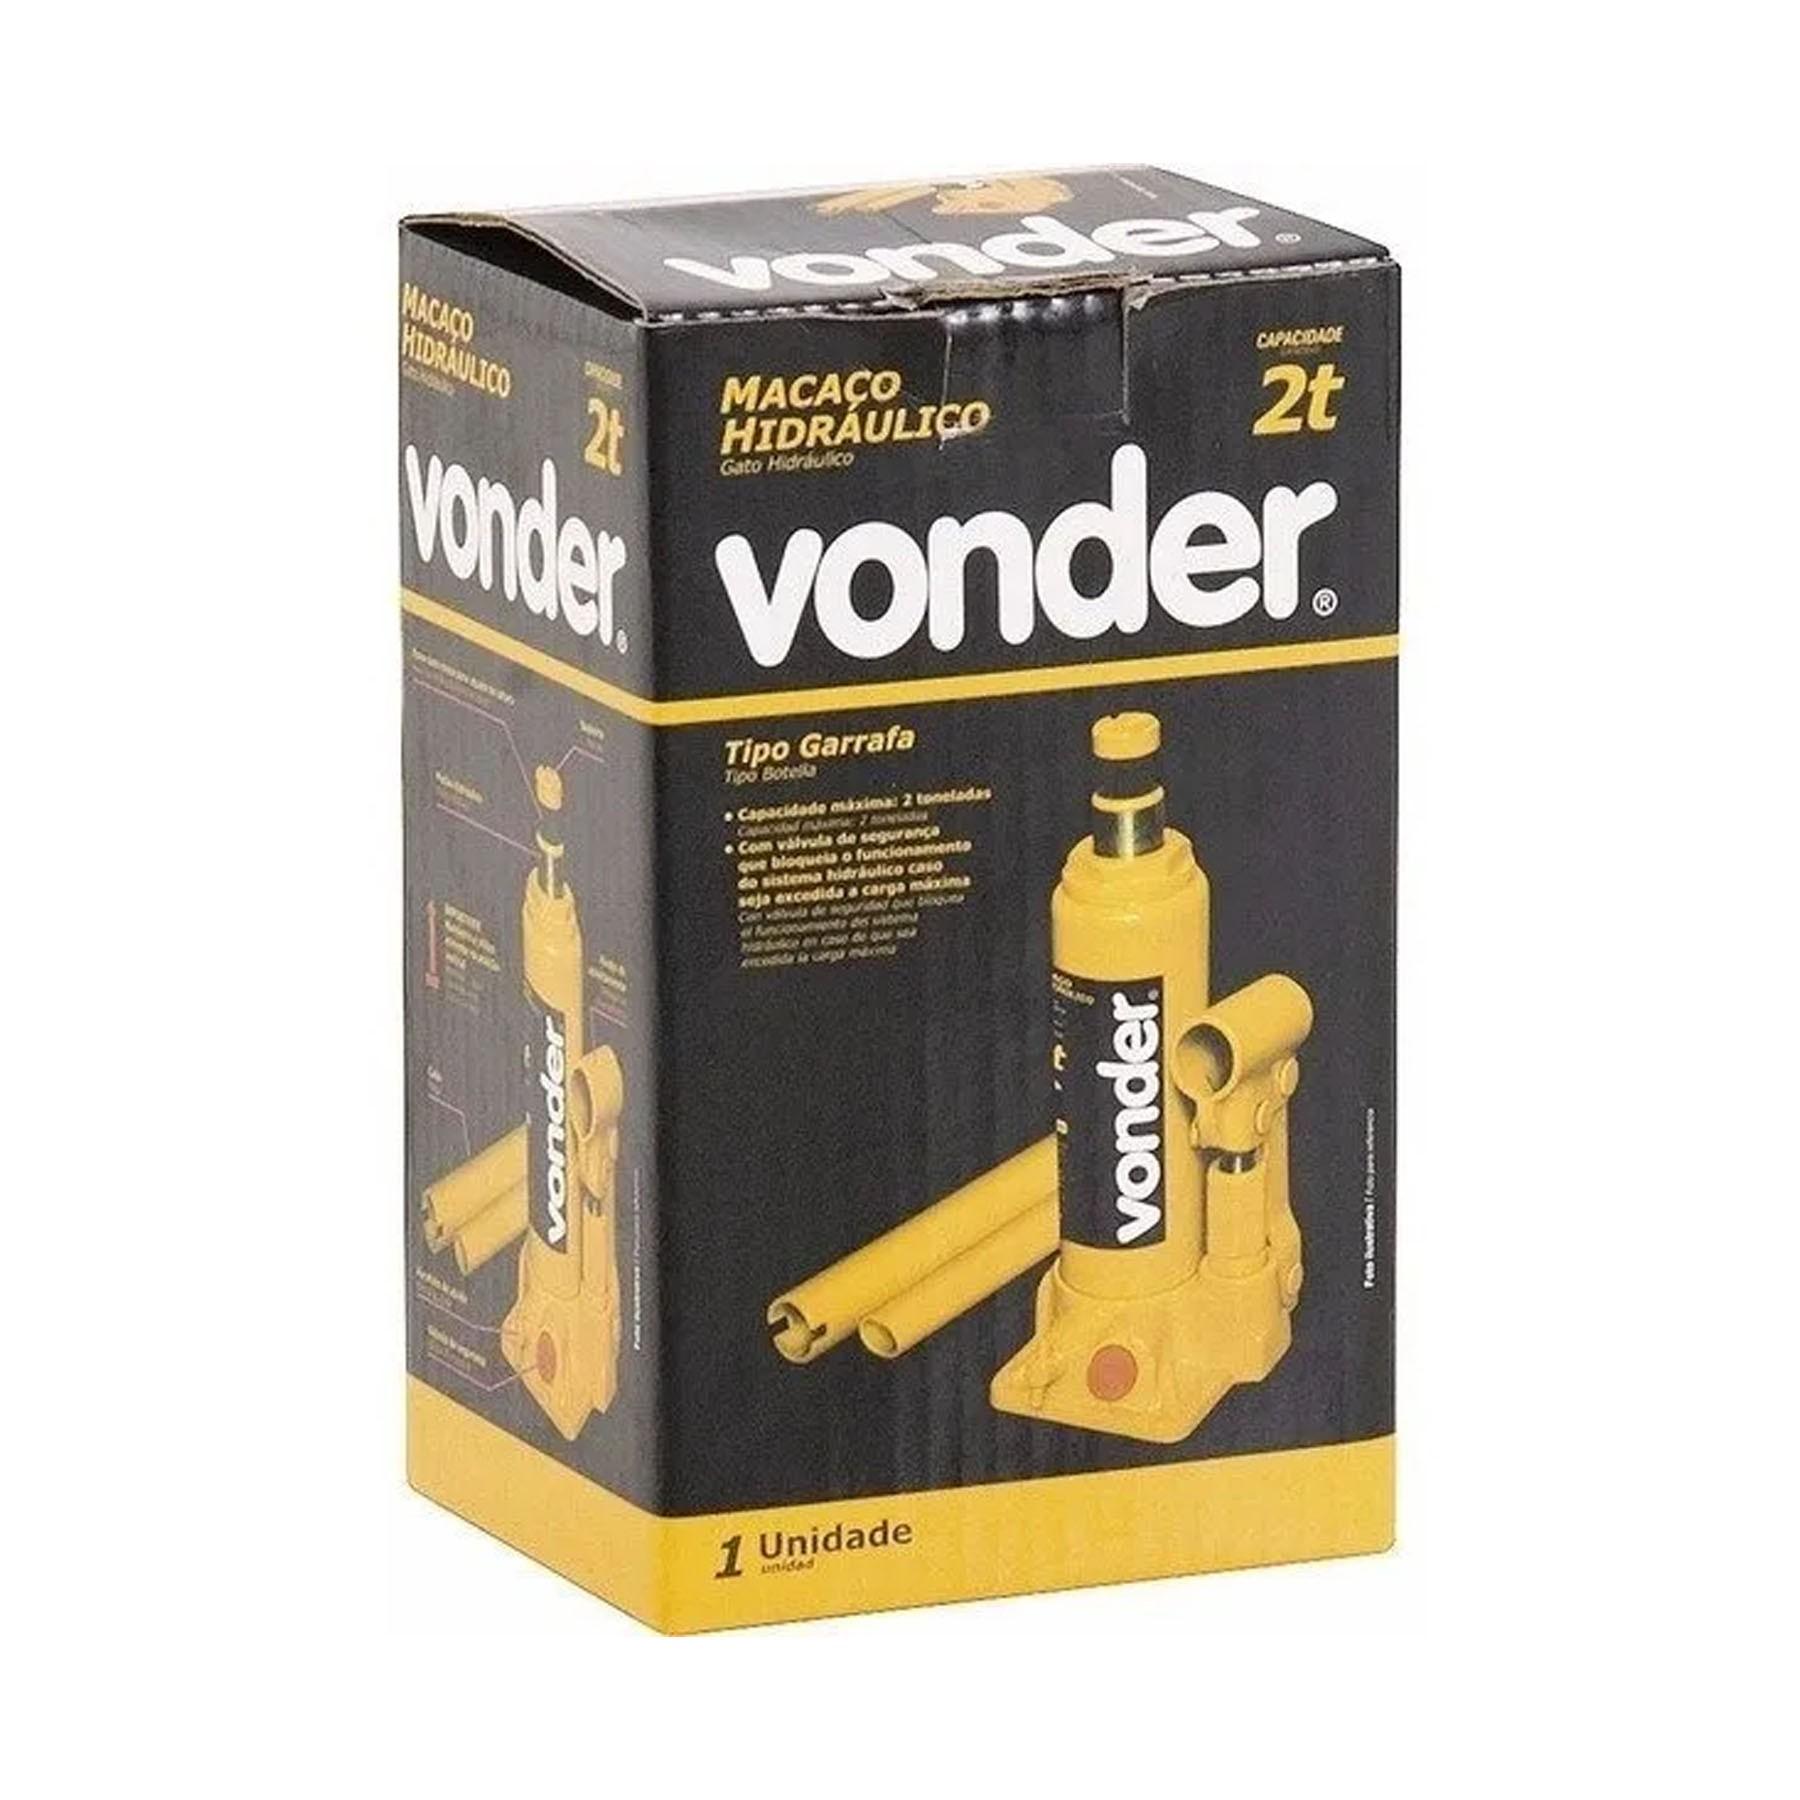 Macaco hidráulico tipo garrafa 2 toneladas (2 tf) VONDER